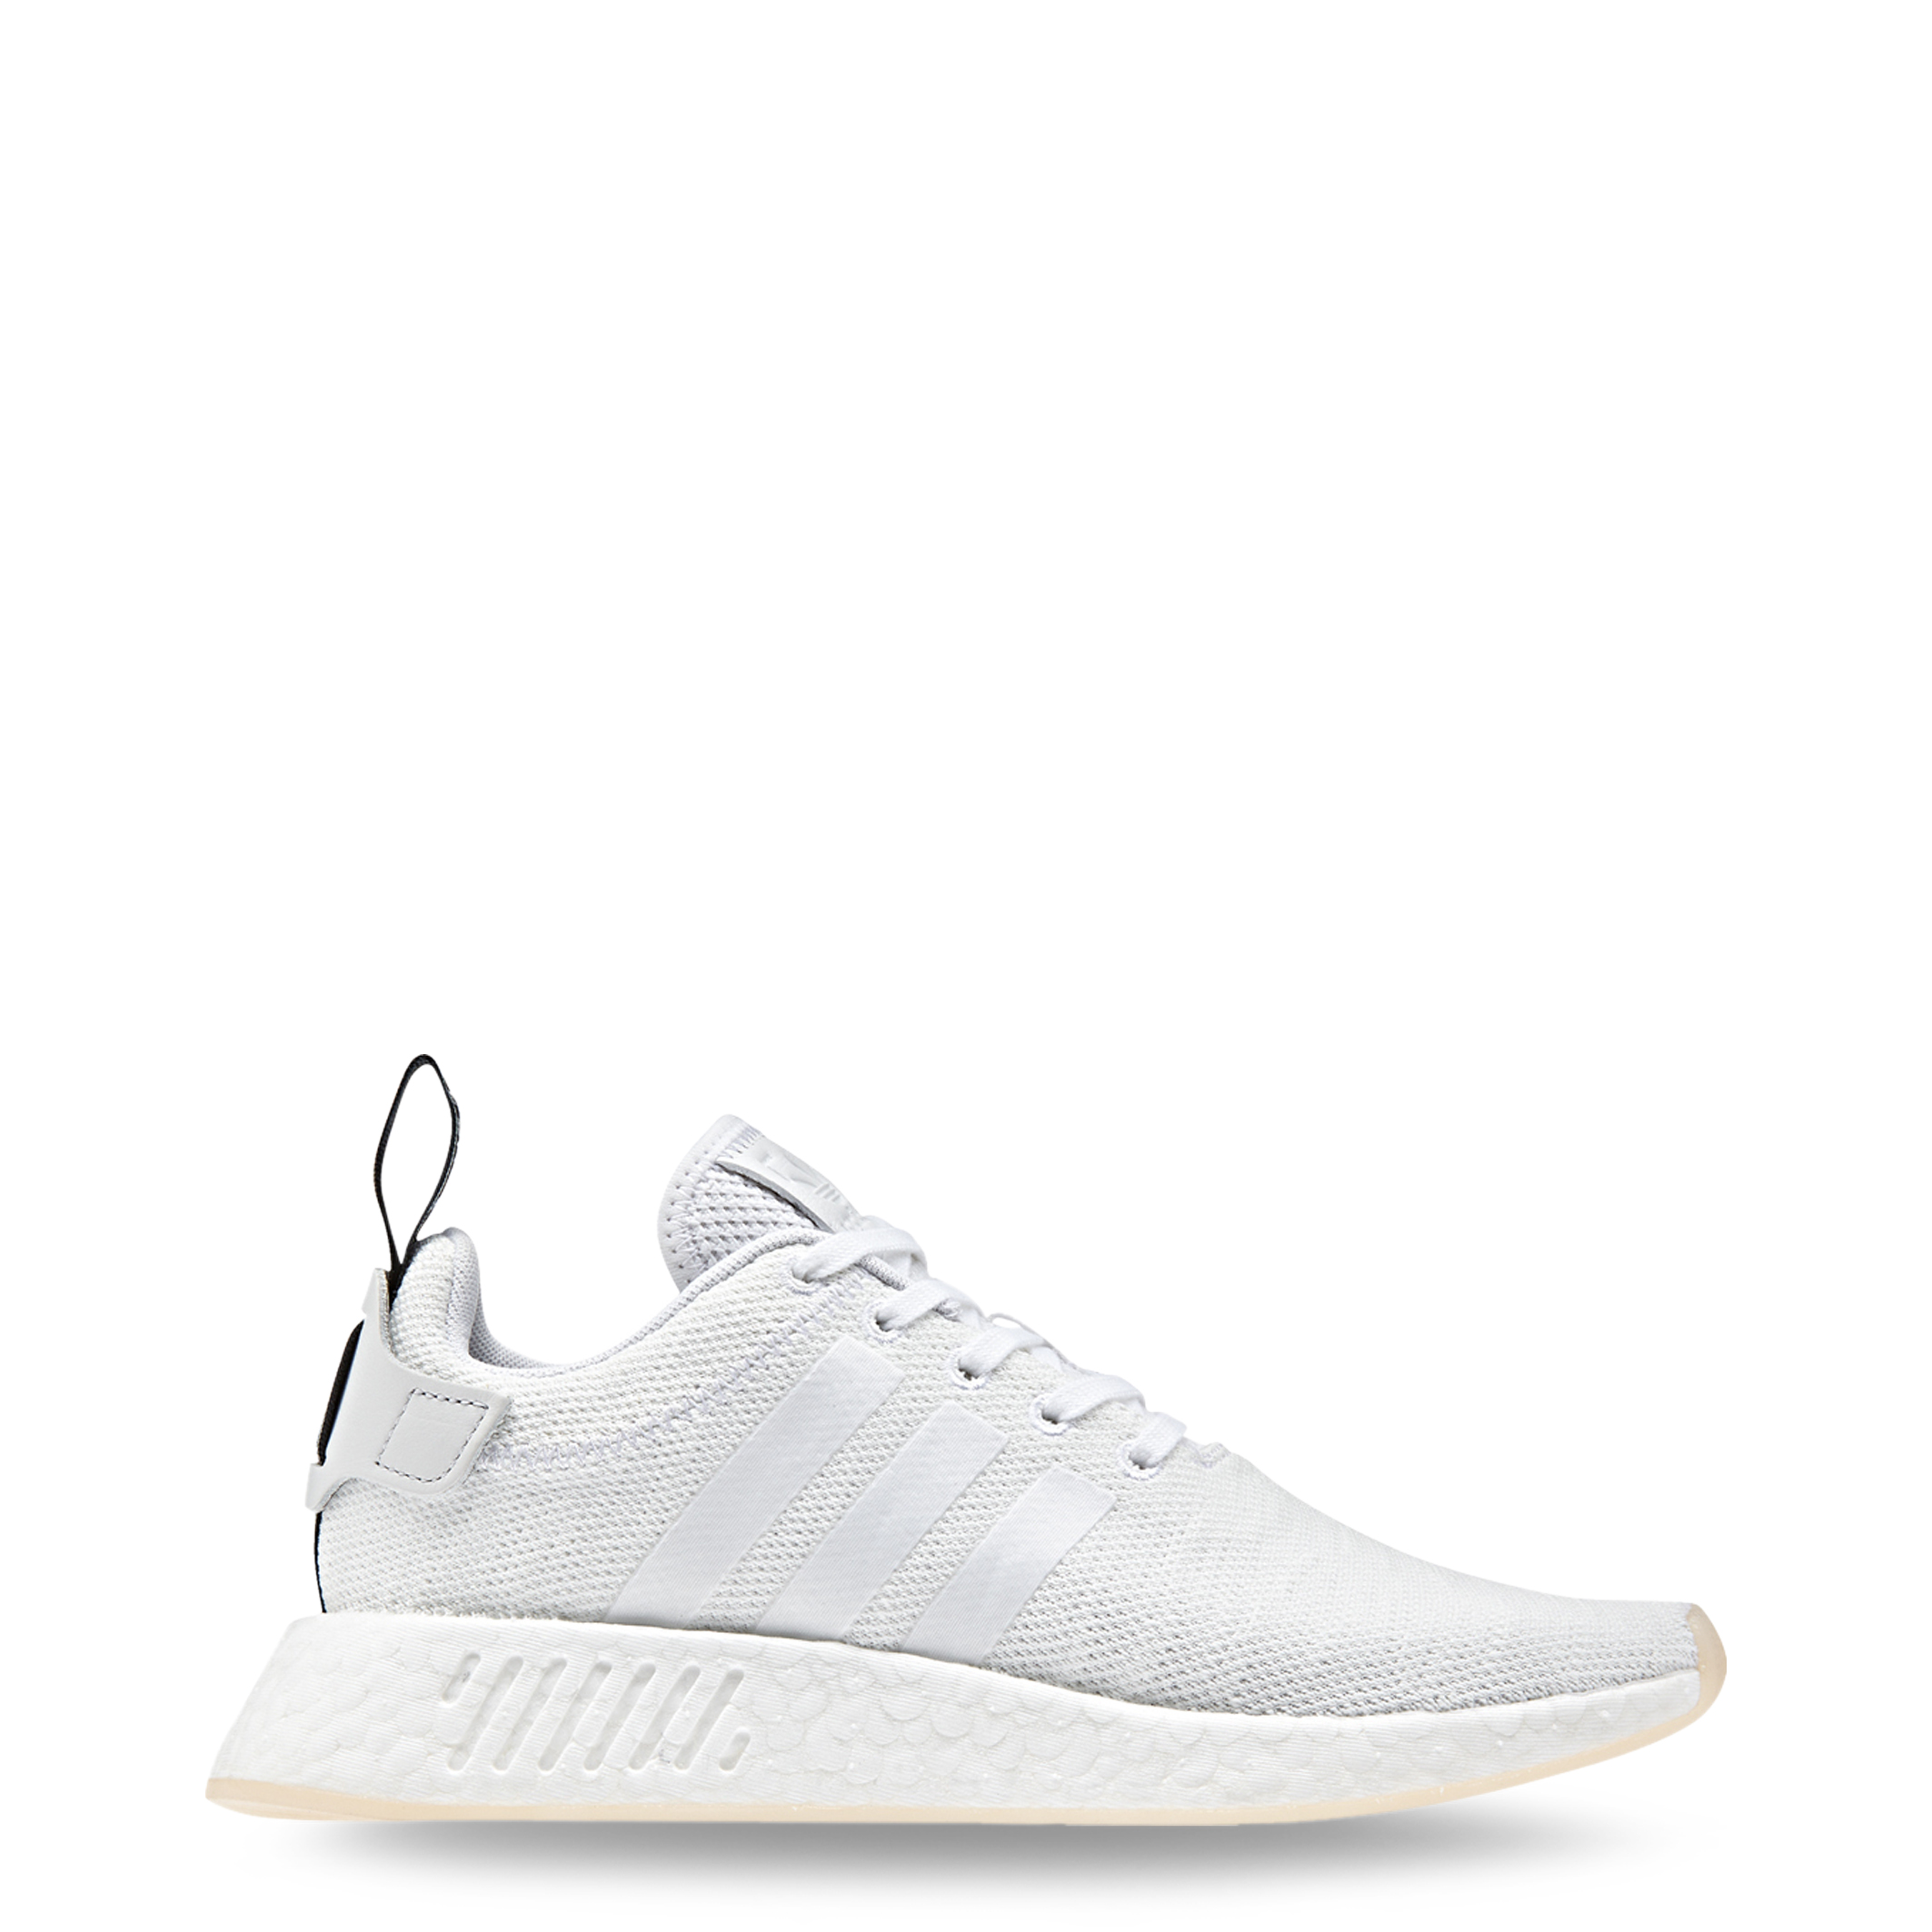 Sneakers Adidas NMD-R2-W Unisex Bianco 101537